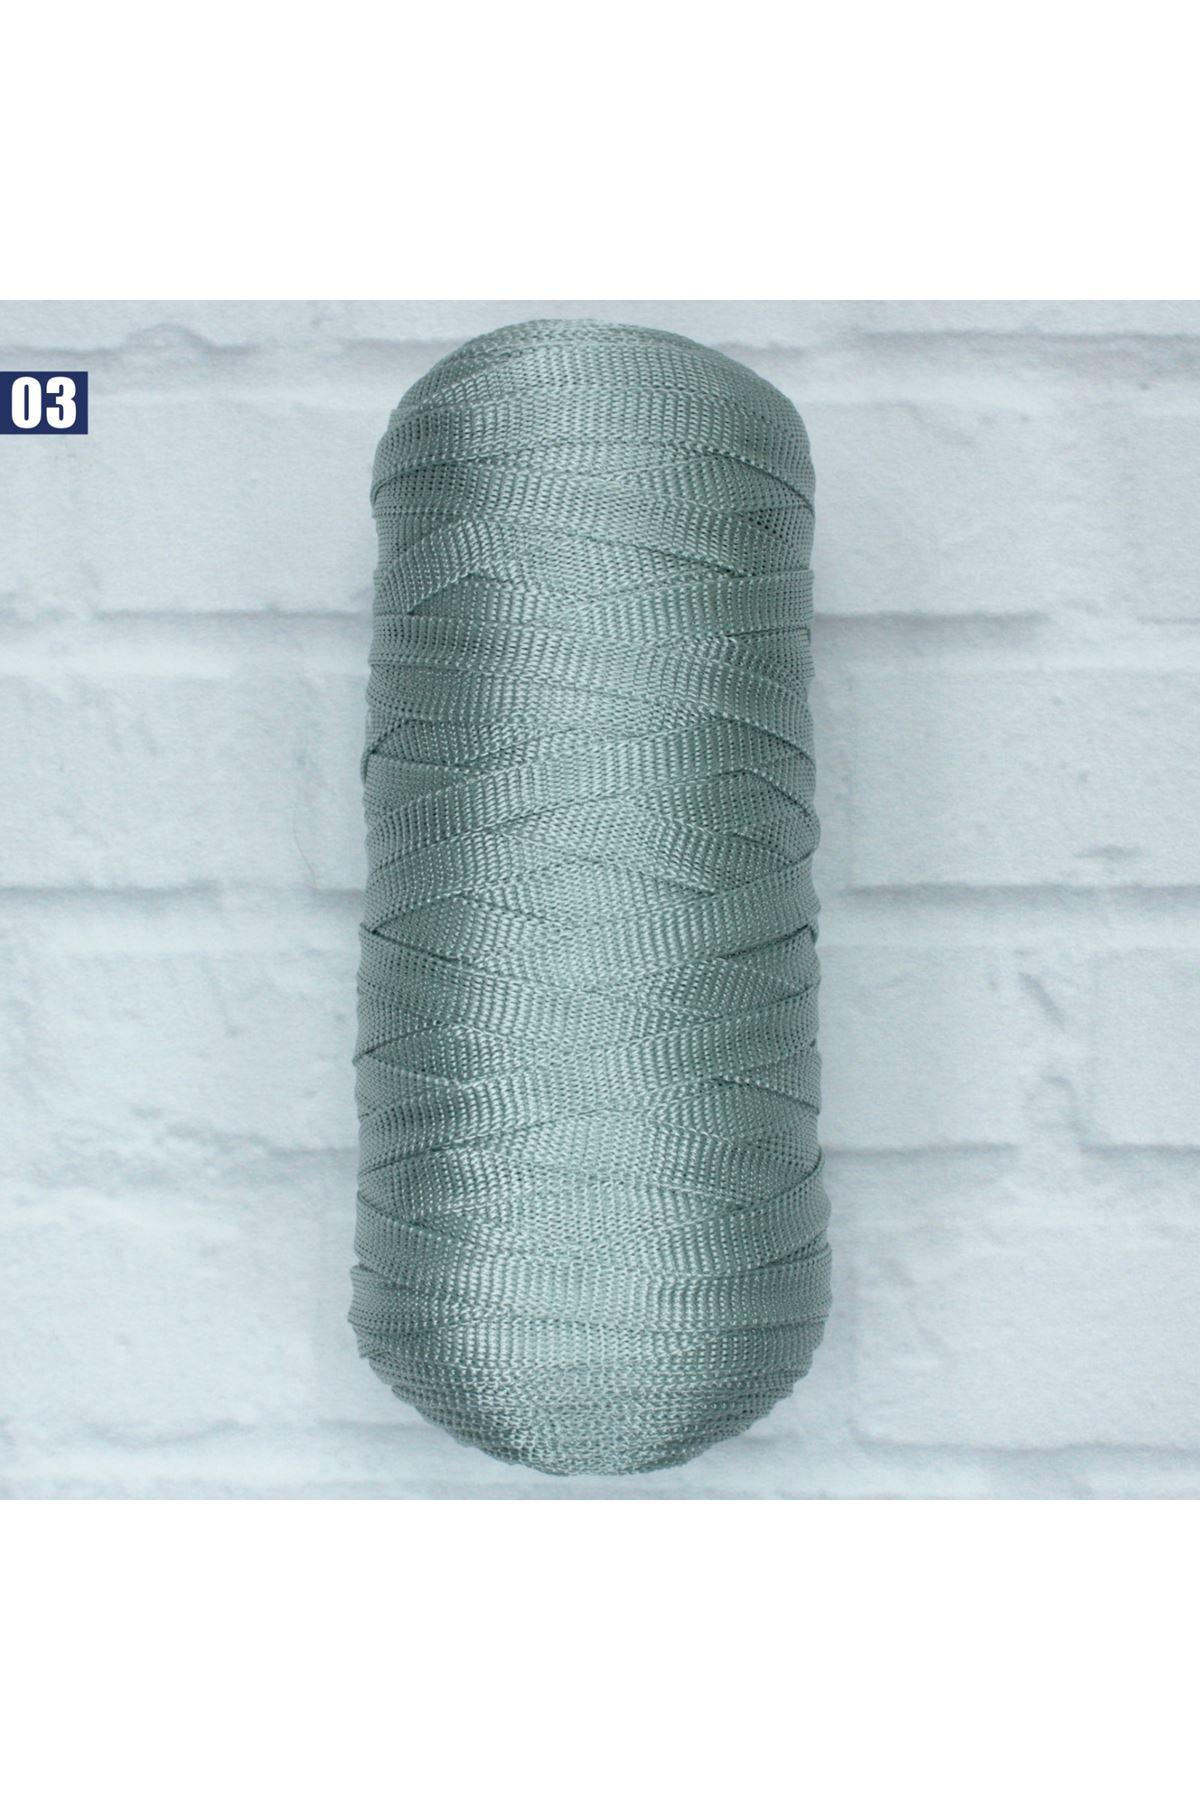 Polyester Ribbon 03